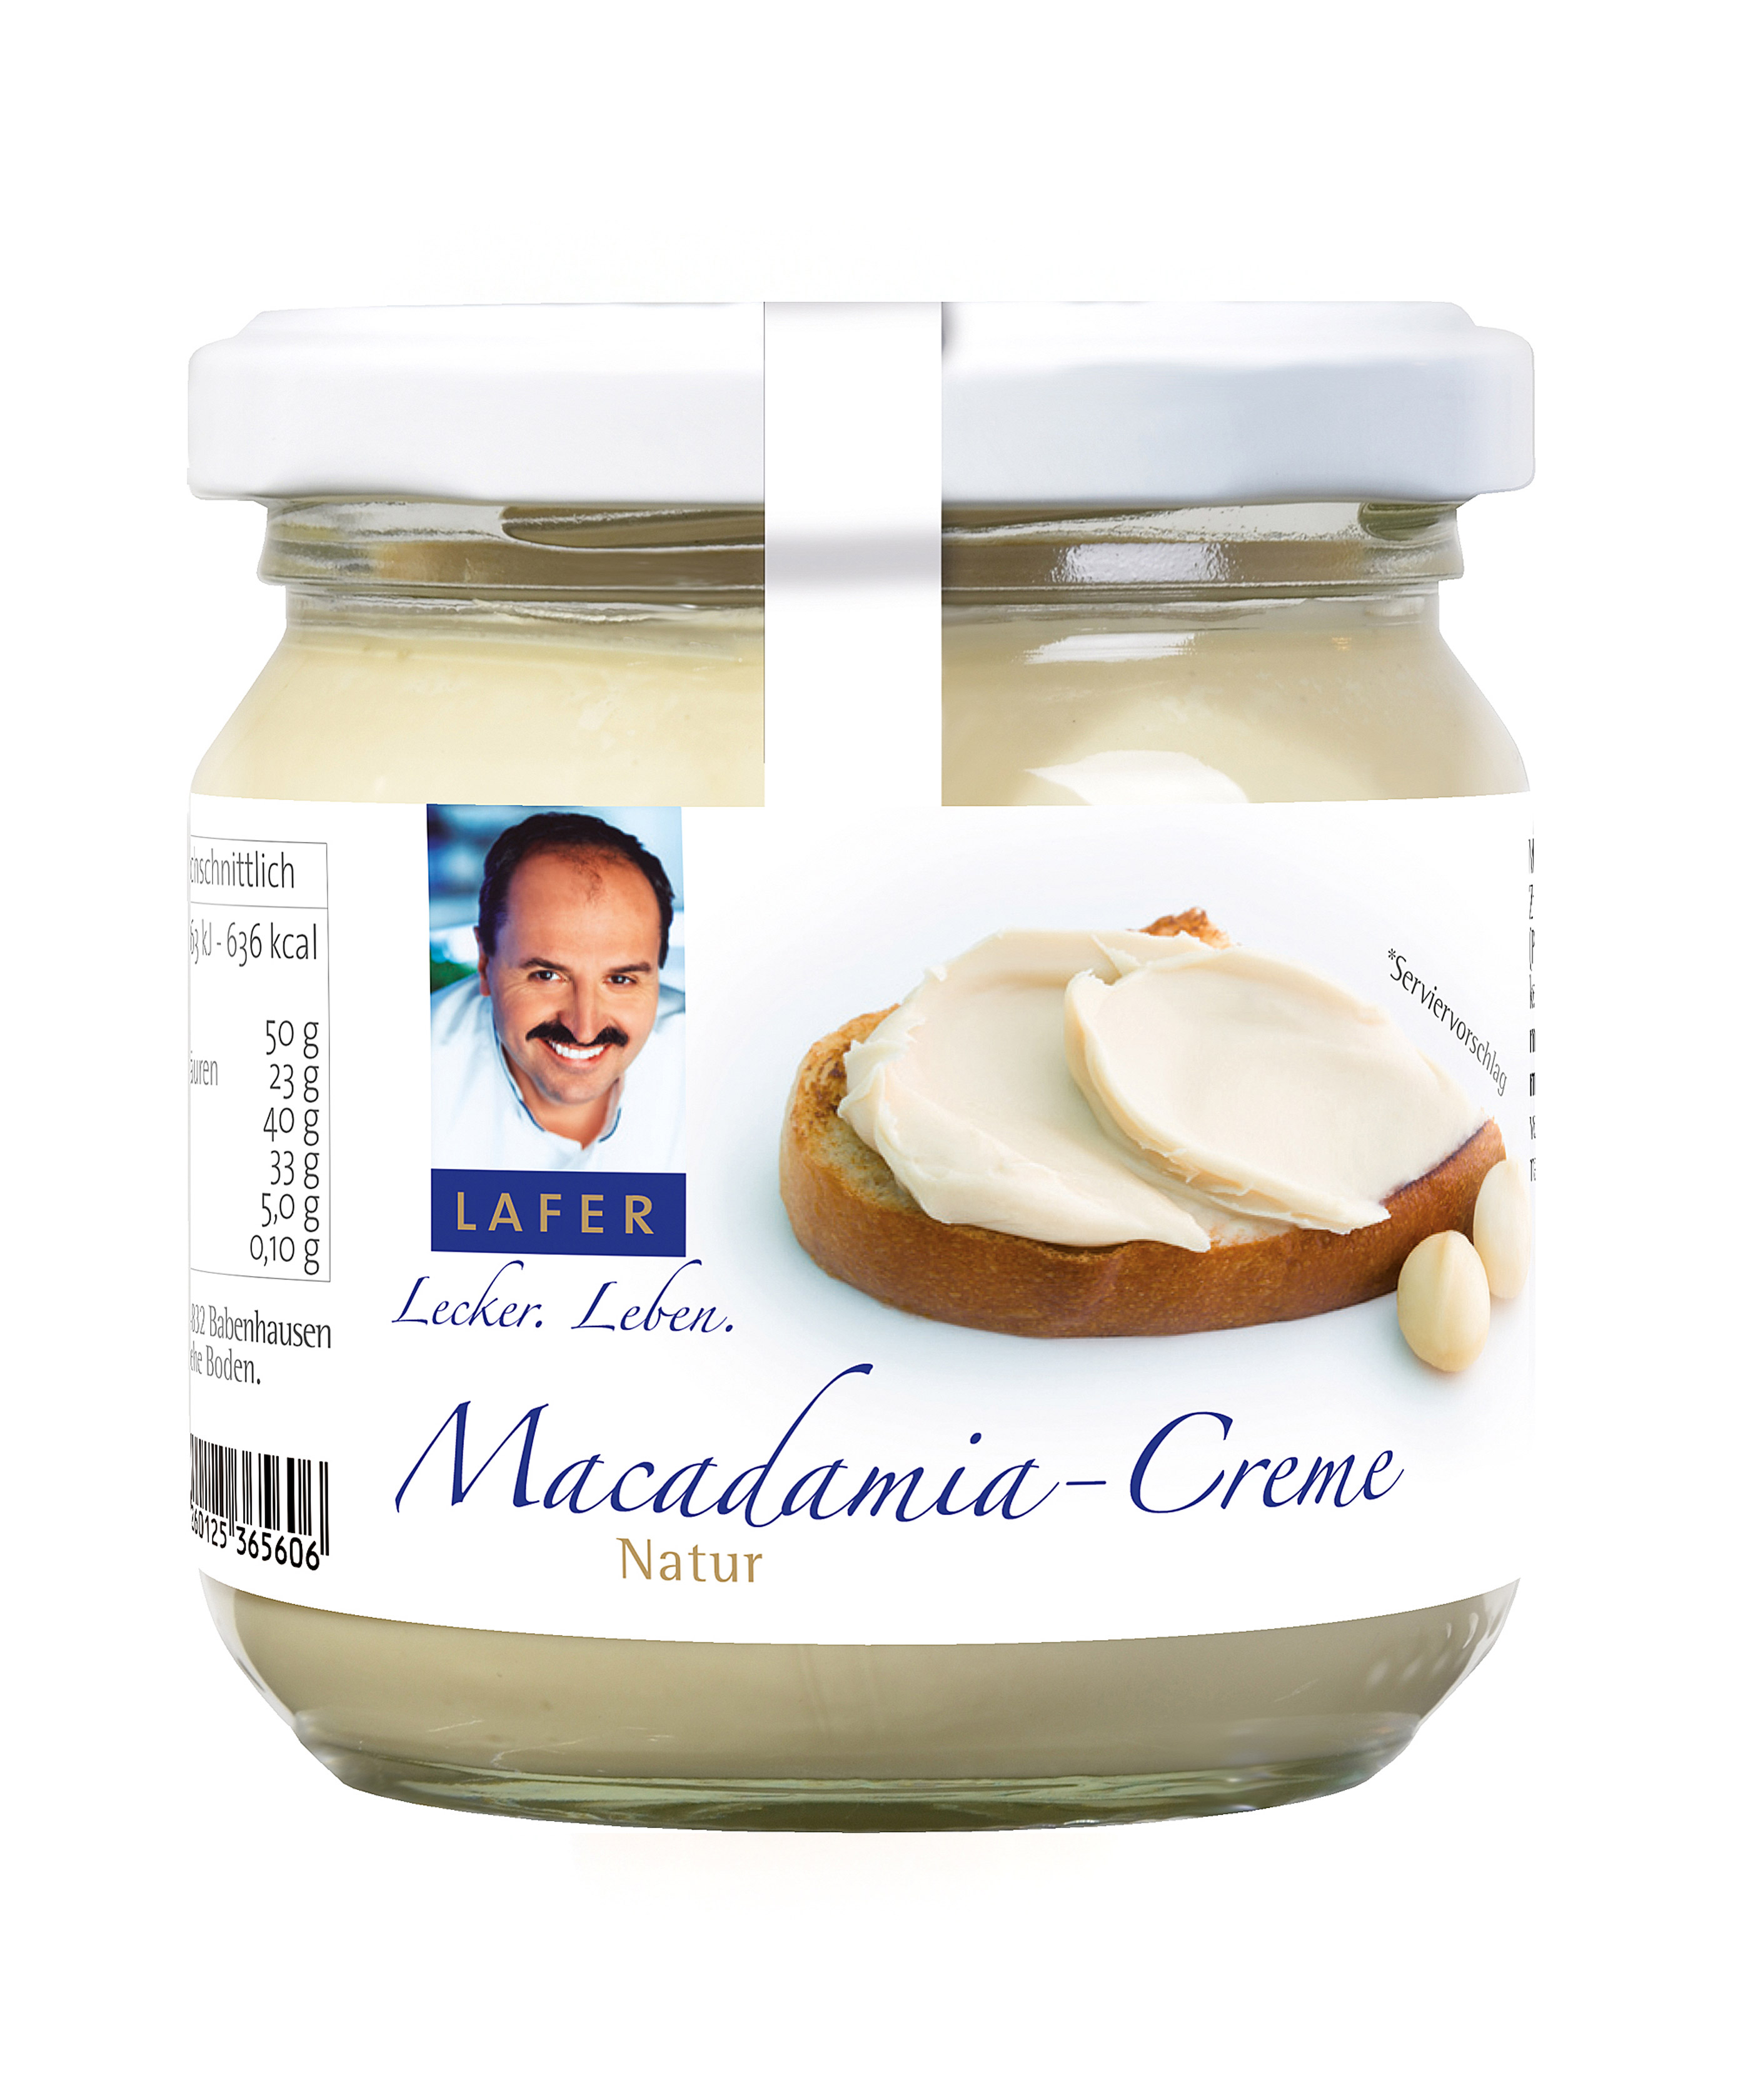 johann-lafer-macadamia-creme-natur-190-g